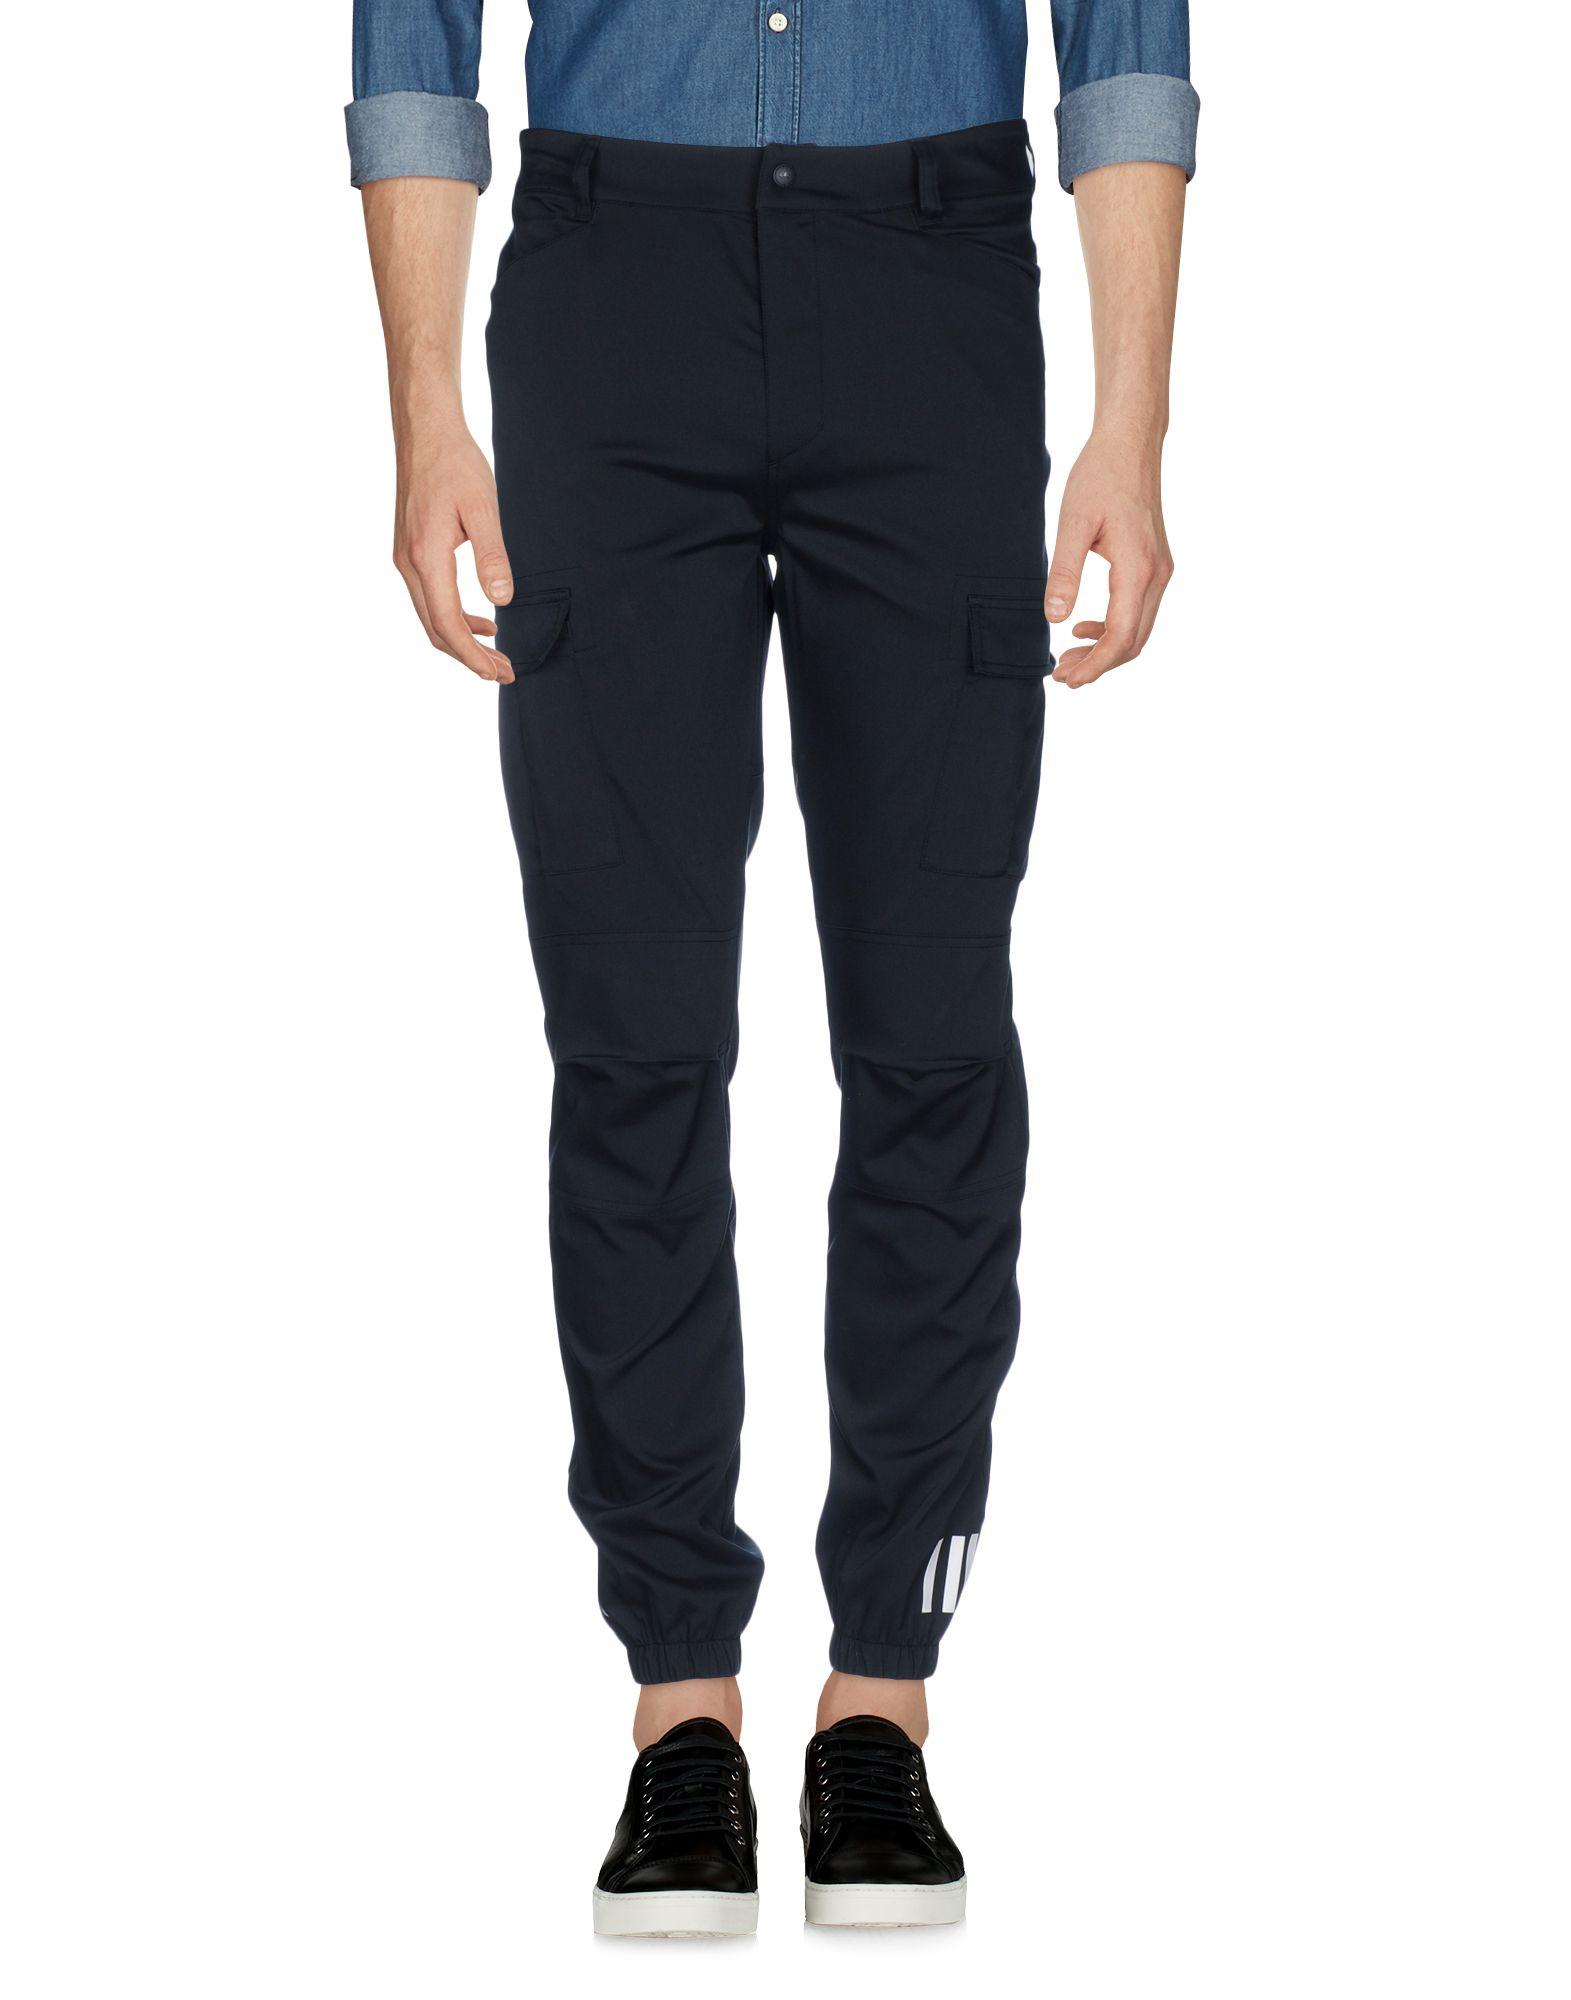 Cargo Adidas Originals Uomo - Acquista online su